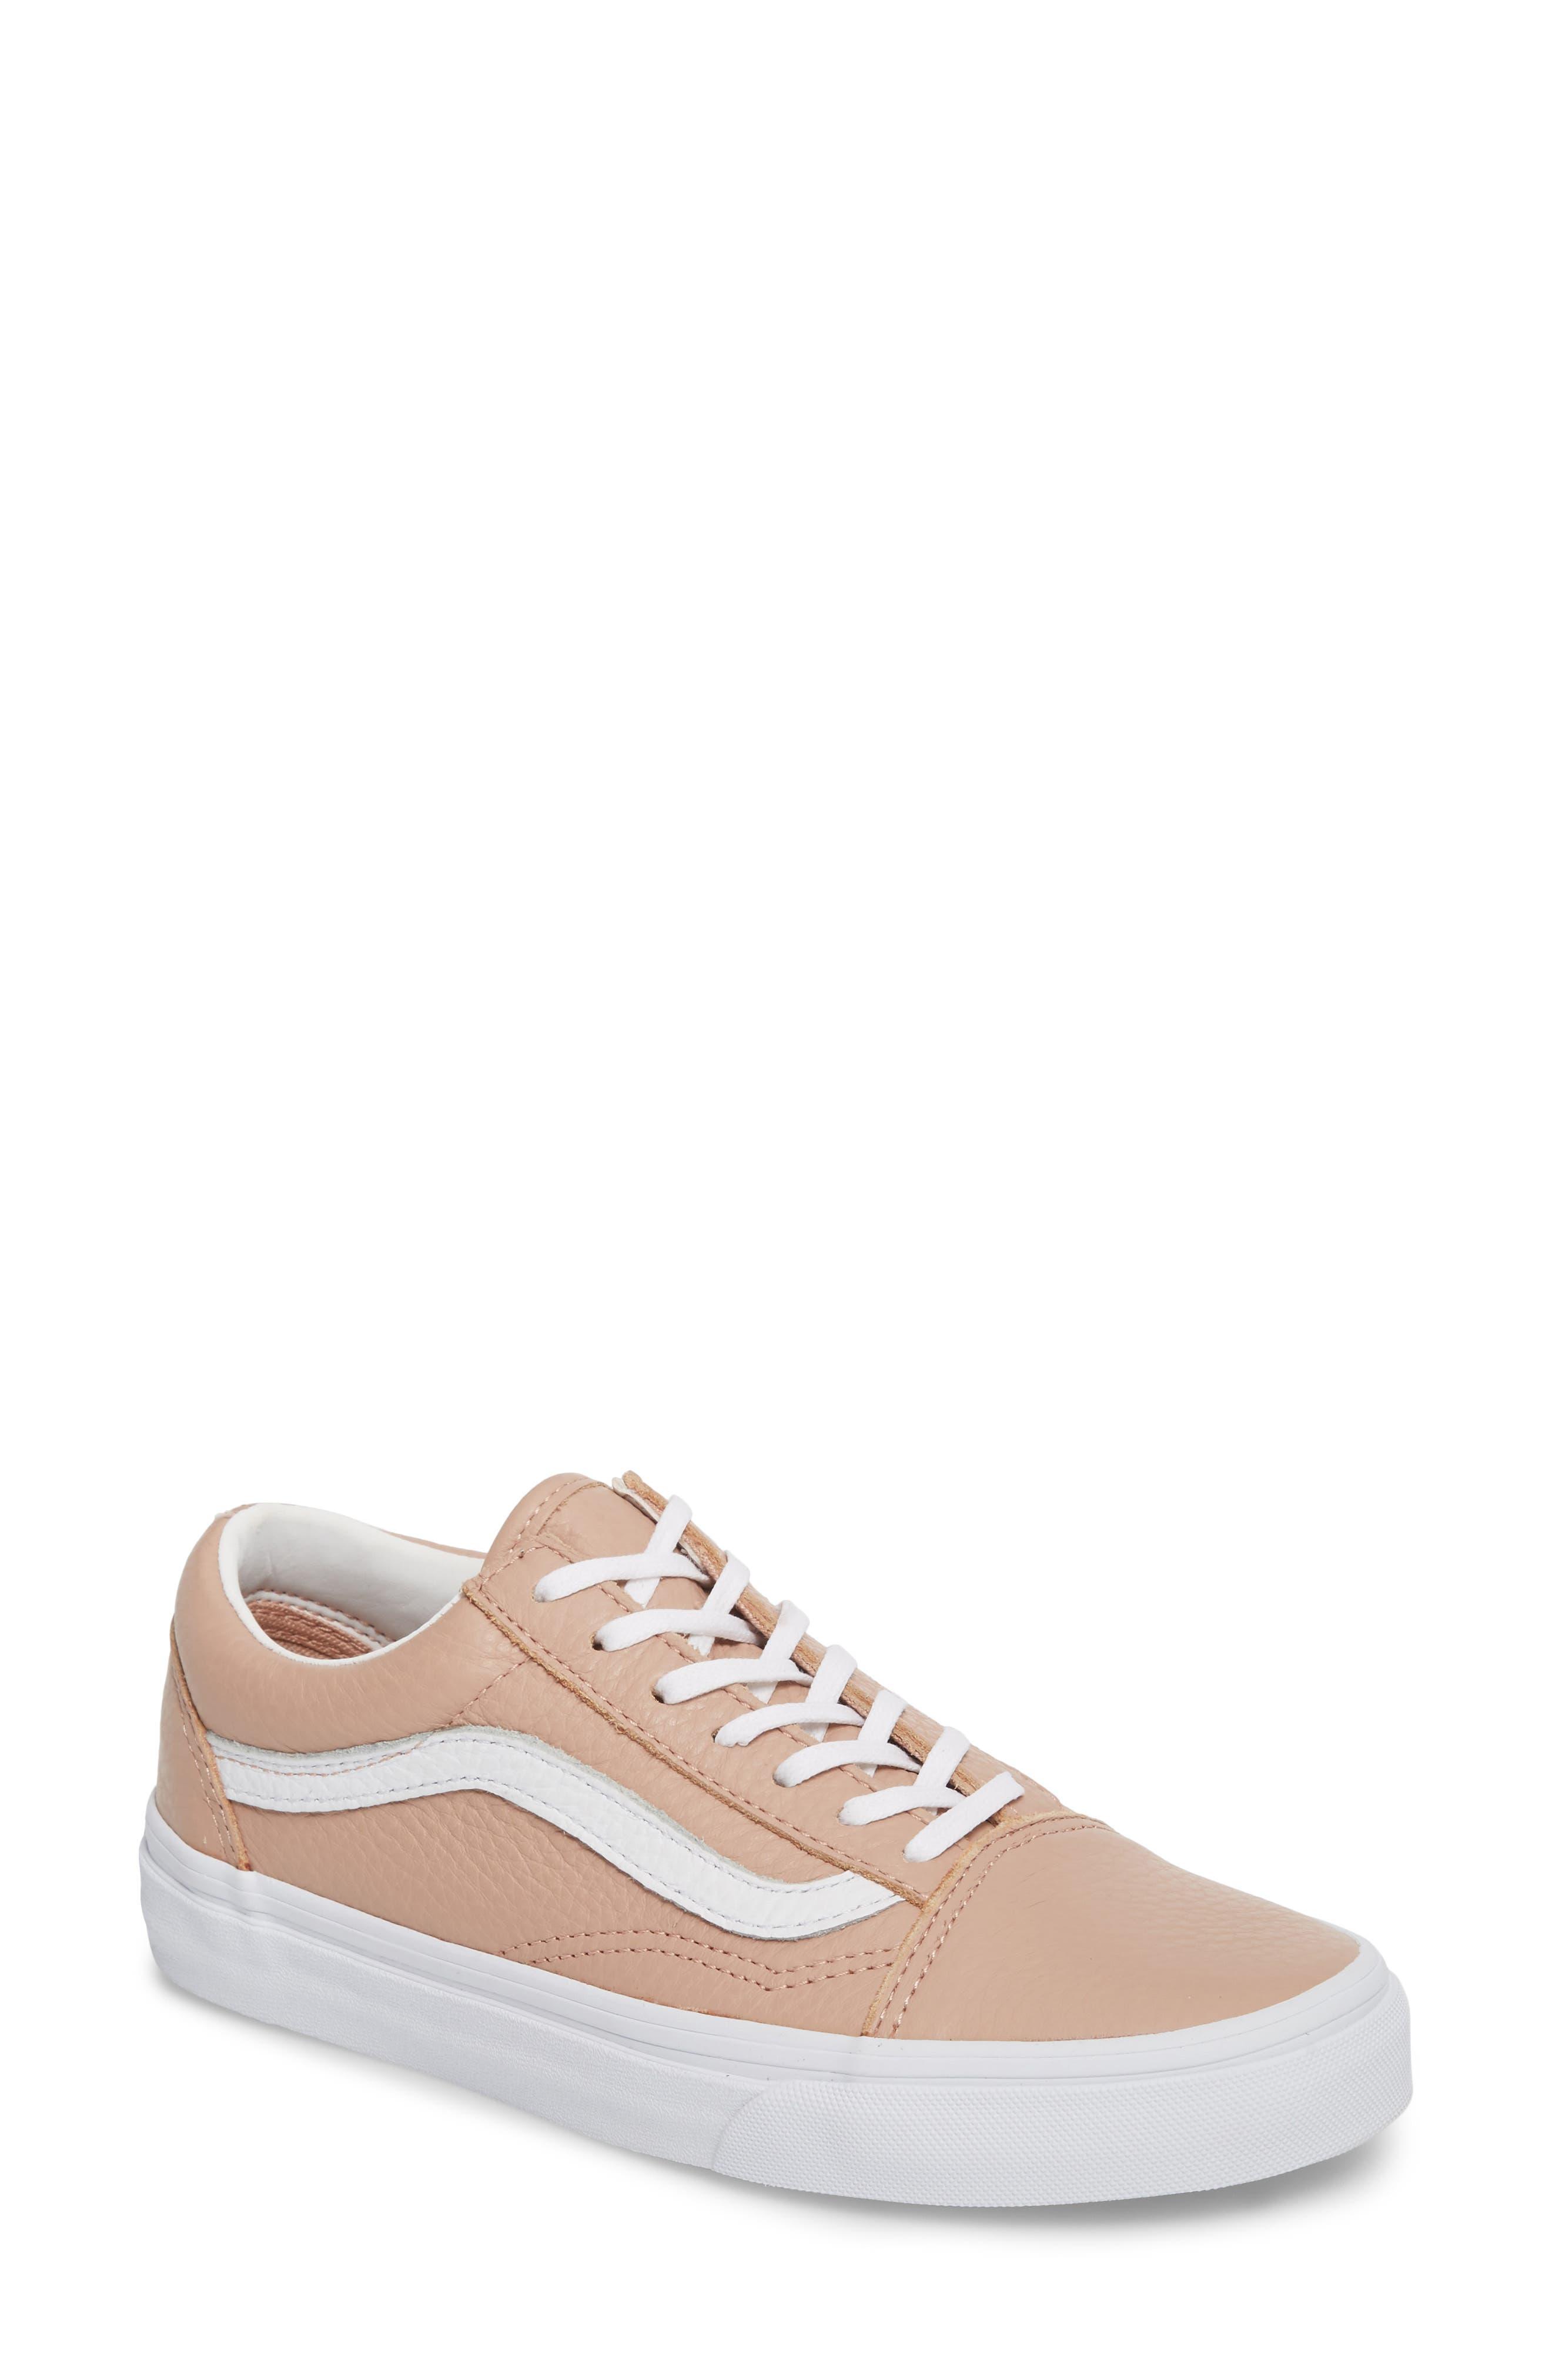 Old Skool DX Sneaker,                         Main,                         color, 652